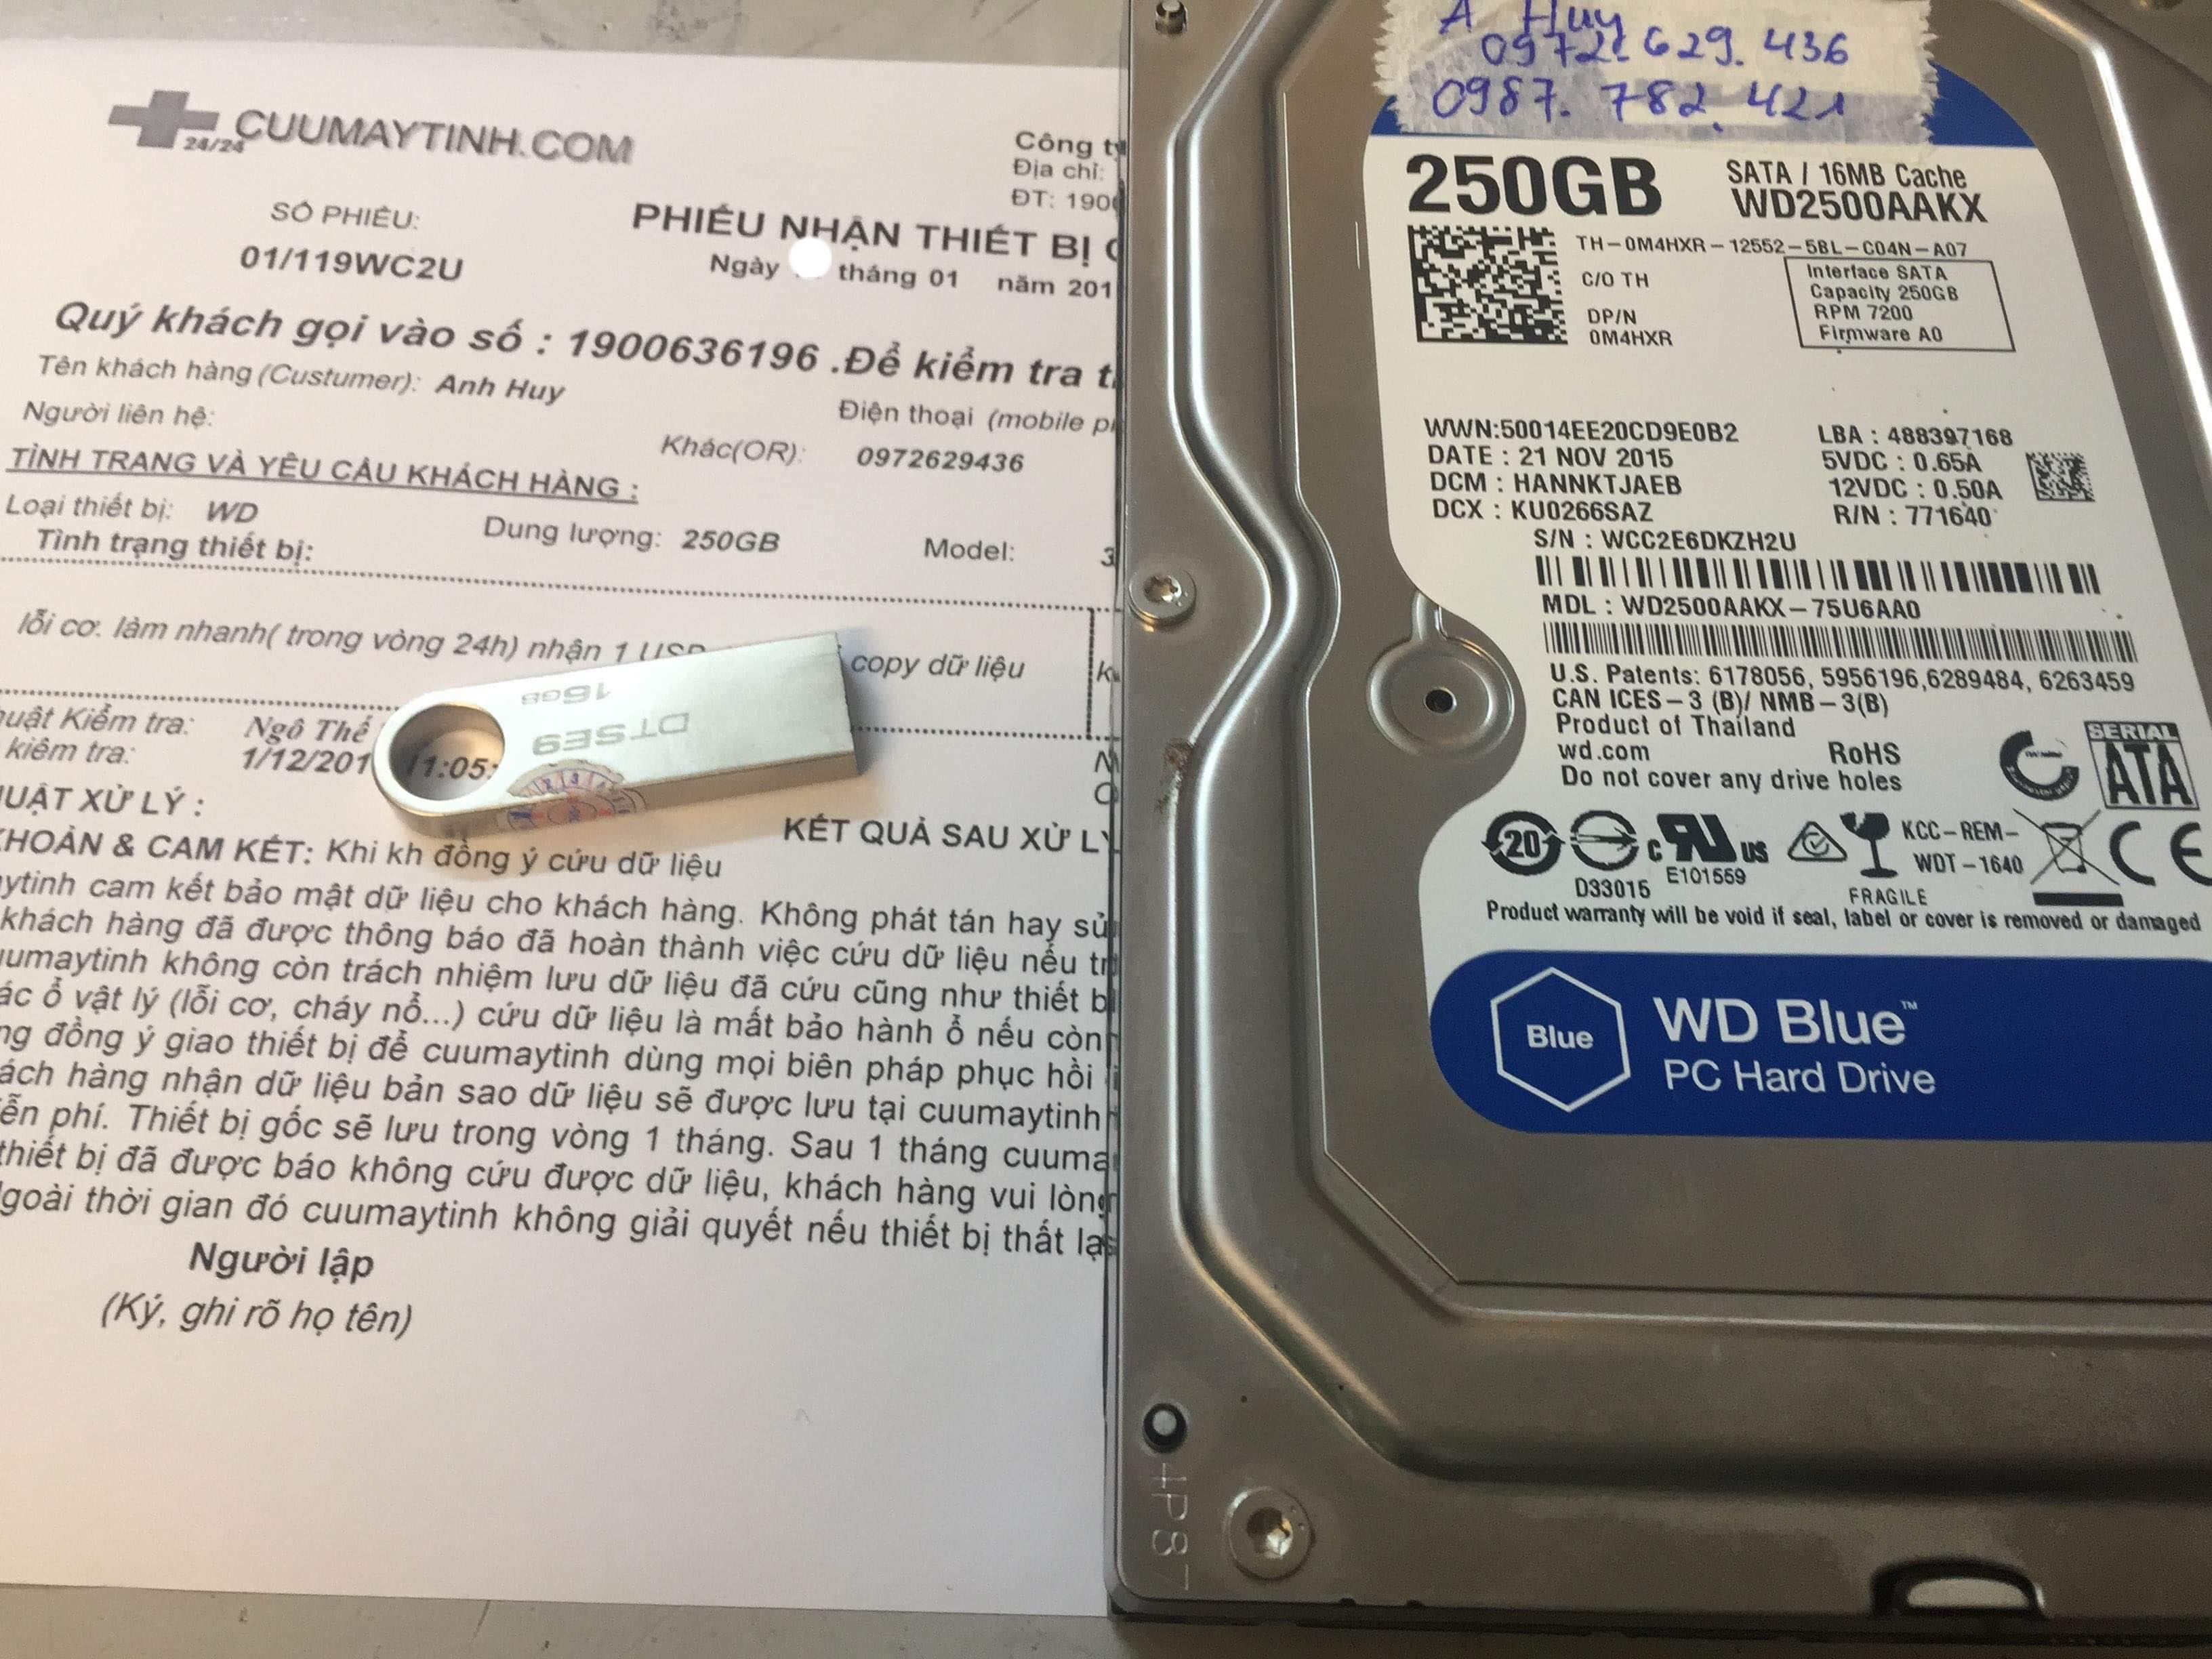 Cứu dữ liệu ổ cứng Western 250GB lỗi cơ 11/01/2019 - cuumaytinh